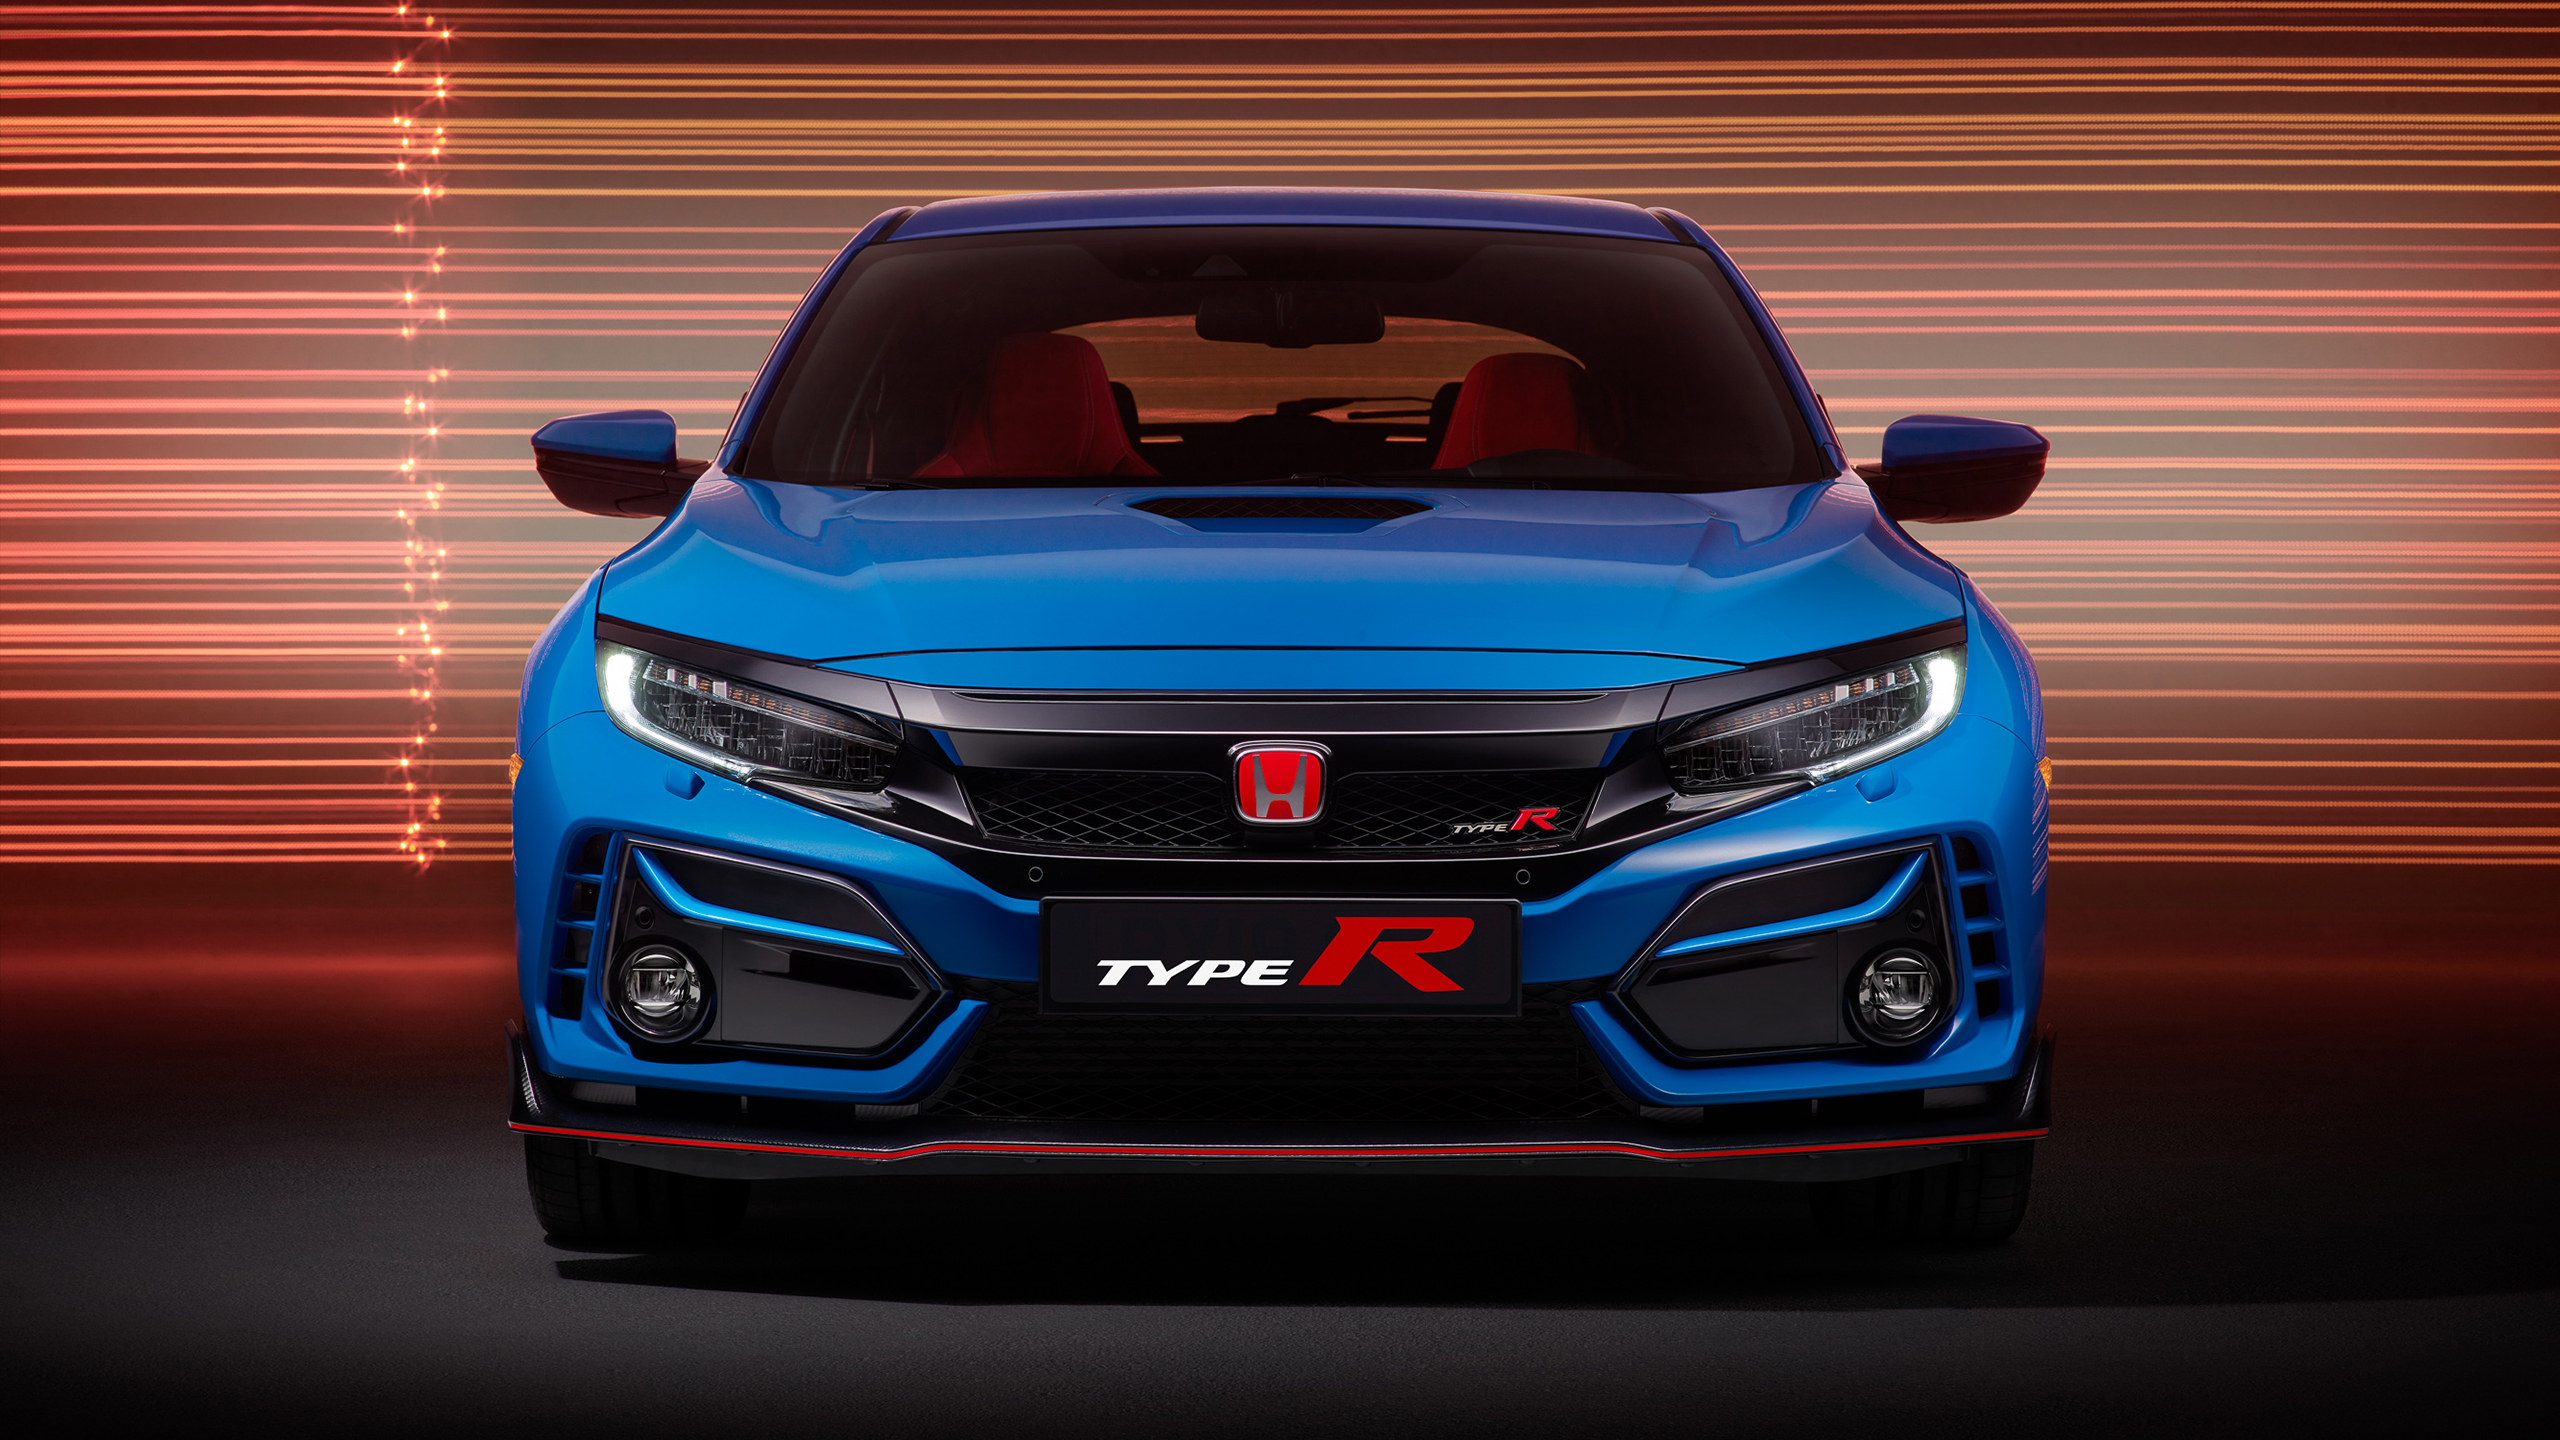 Kekurangan Honda Gt Murah Berkualitas